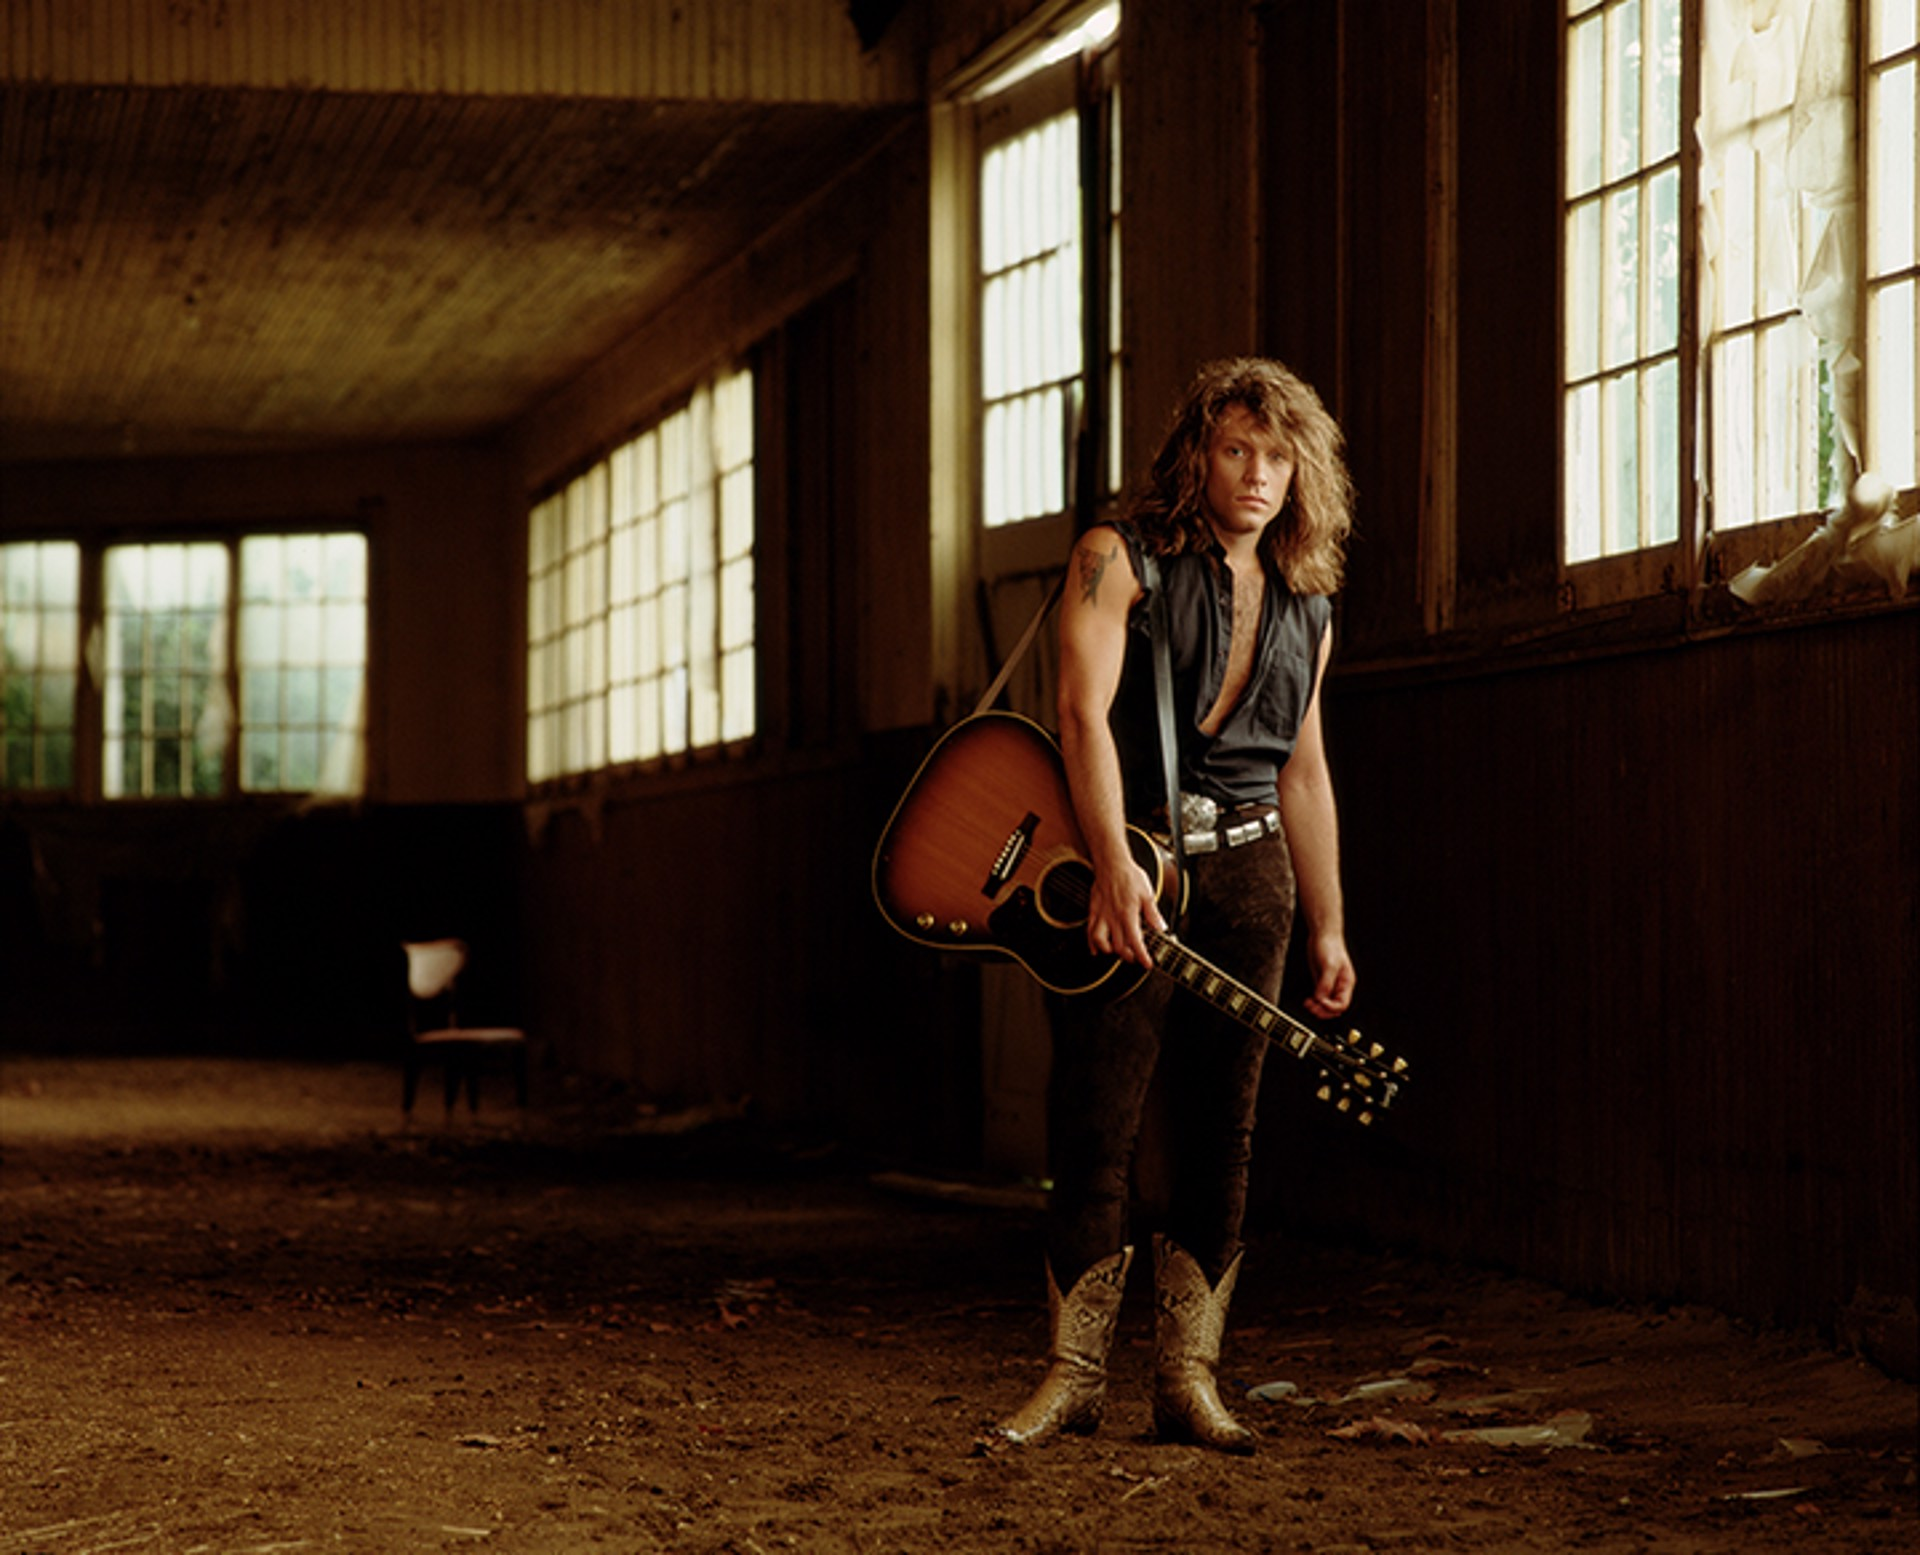 90085 Jon Bon Jovi in the Barn Color by Timothy White